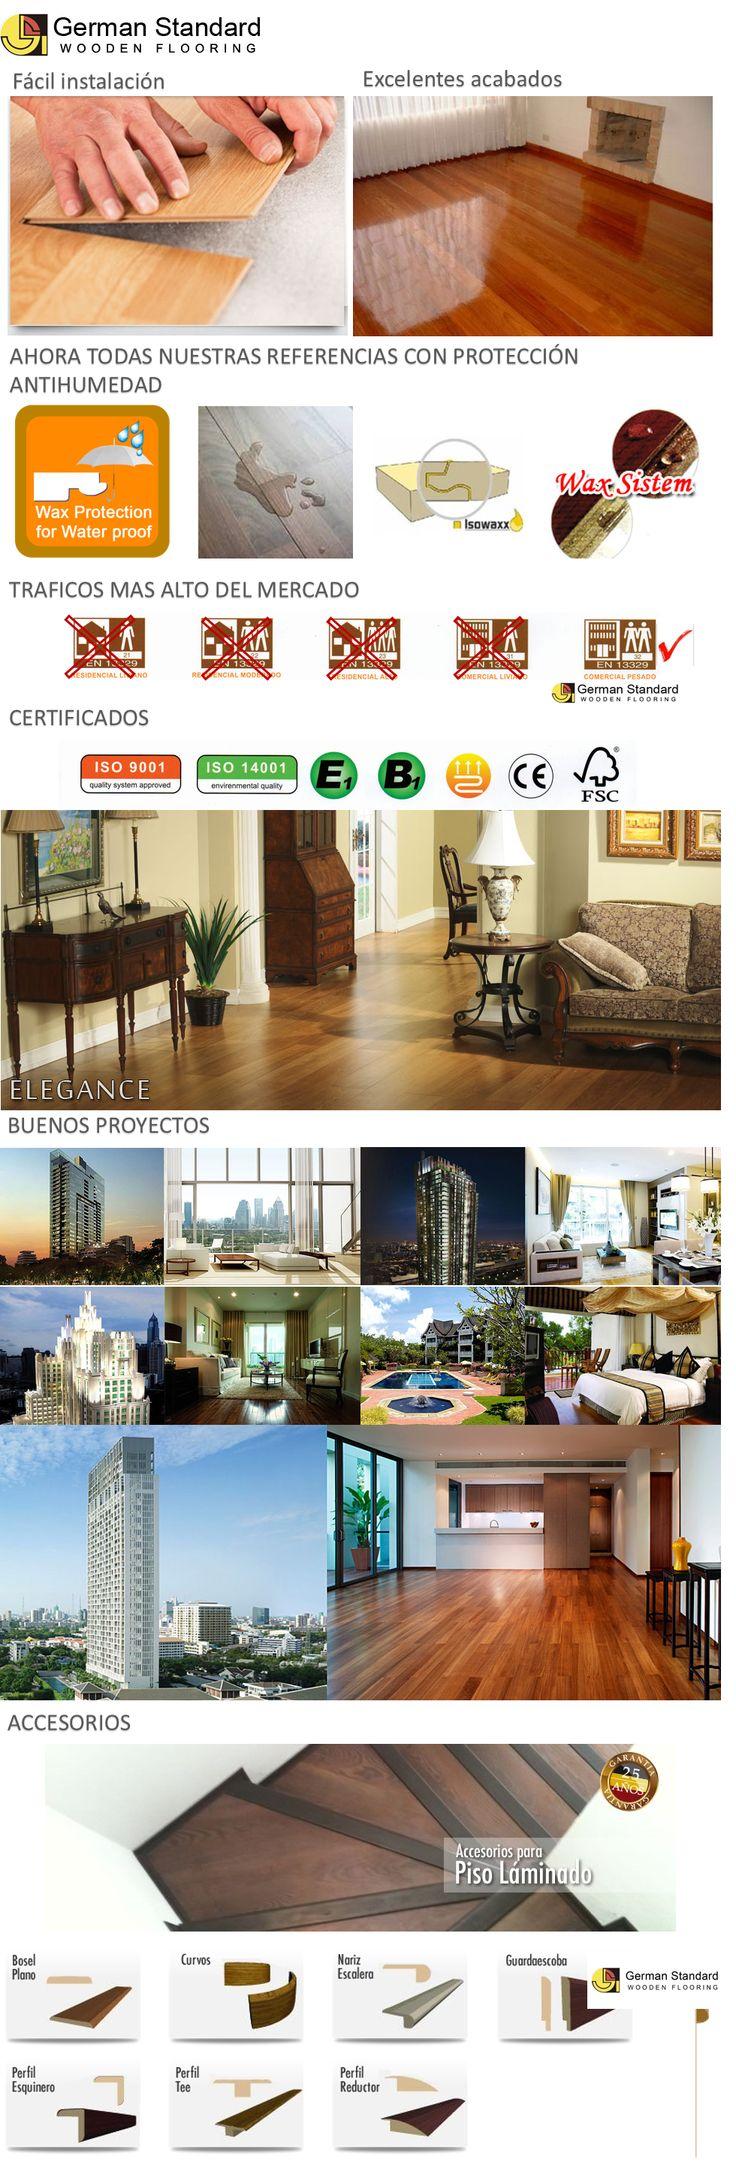 piso+laminado+bogota+instalacion+100+aleman+mantenimiento+3115085129+bogota,+d.c.+bogota,+d.c.+colombia